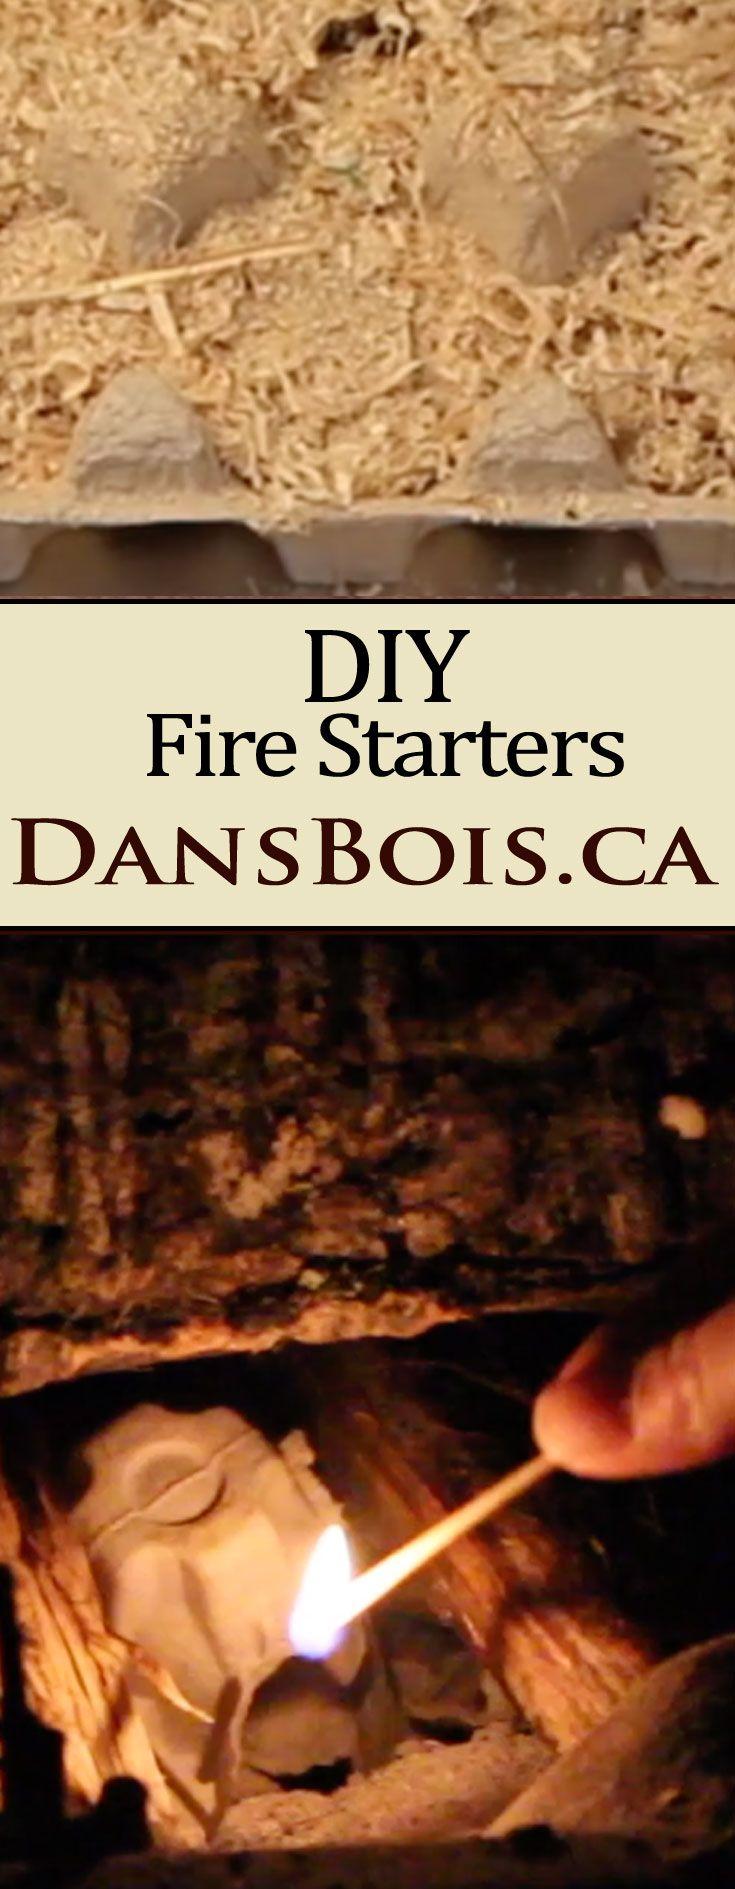 DIY Firelighters - Fire Starters From Repurposed Materials  #fire #woodheat #woodstove #repurposed #firestarter